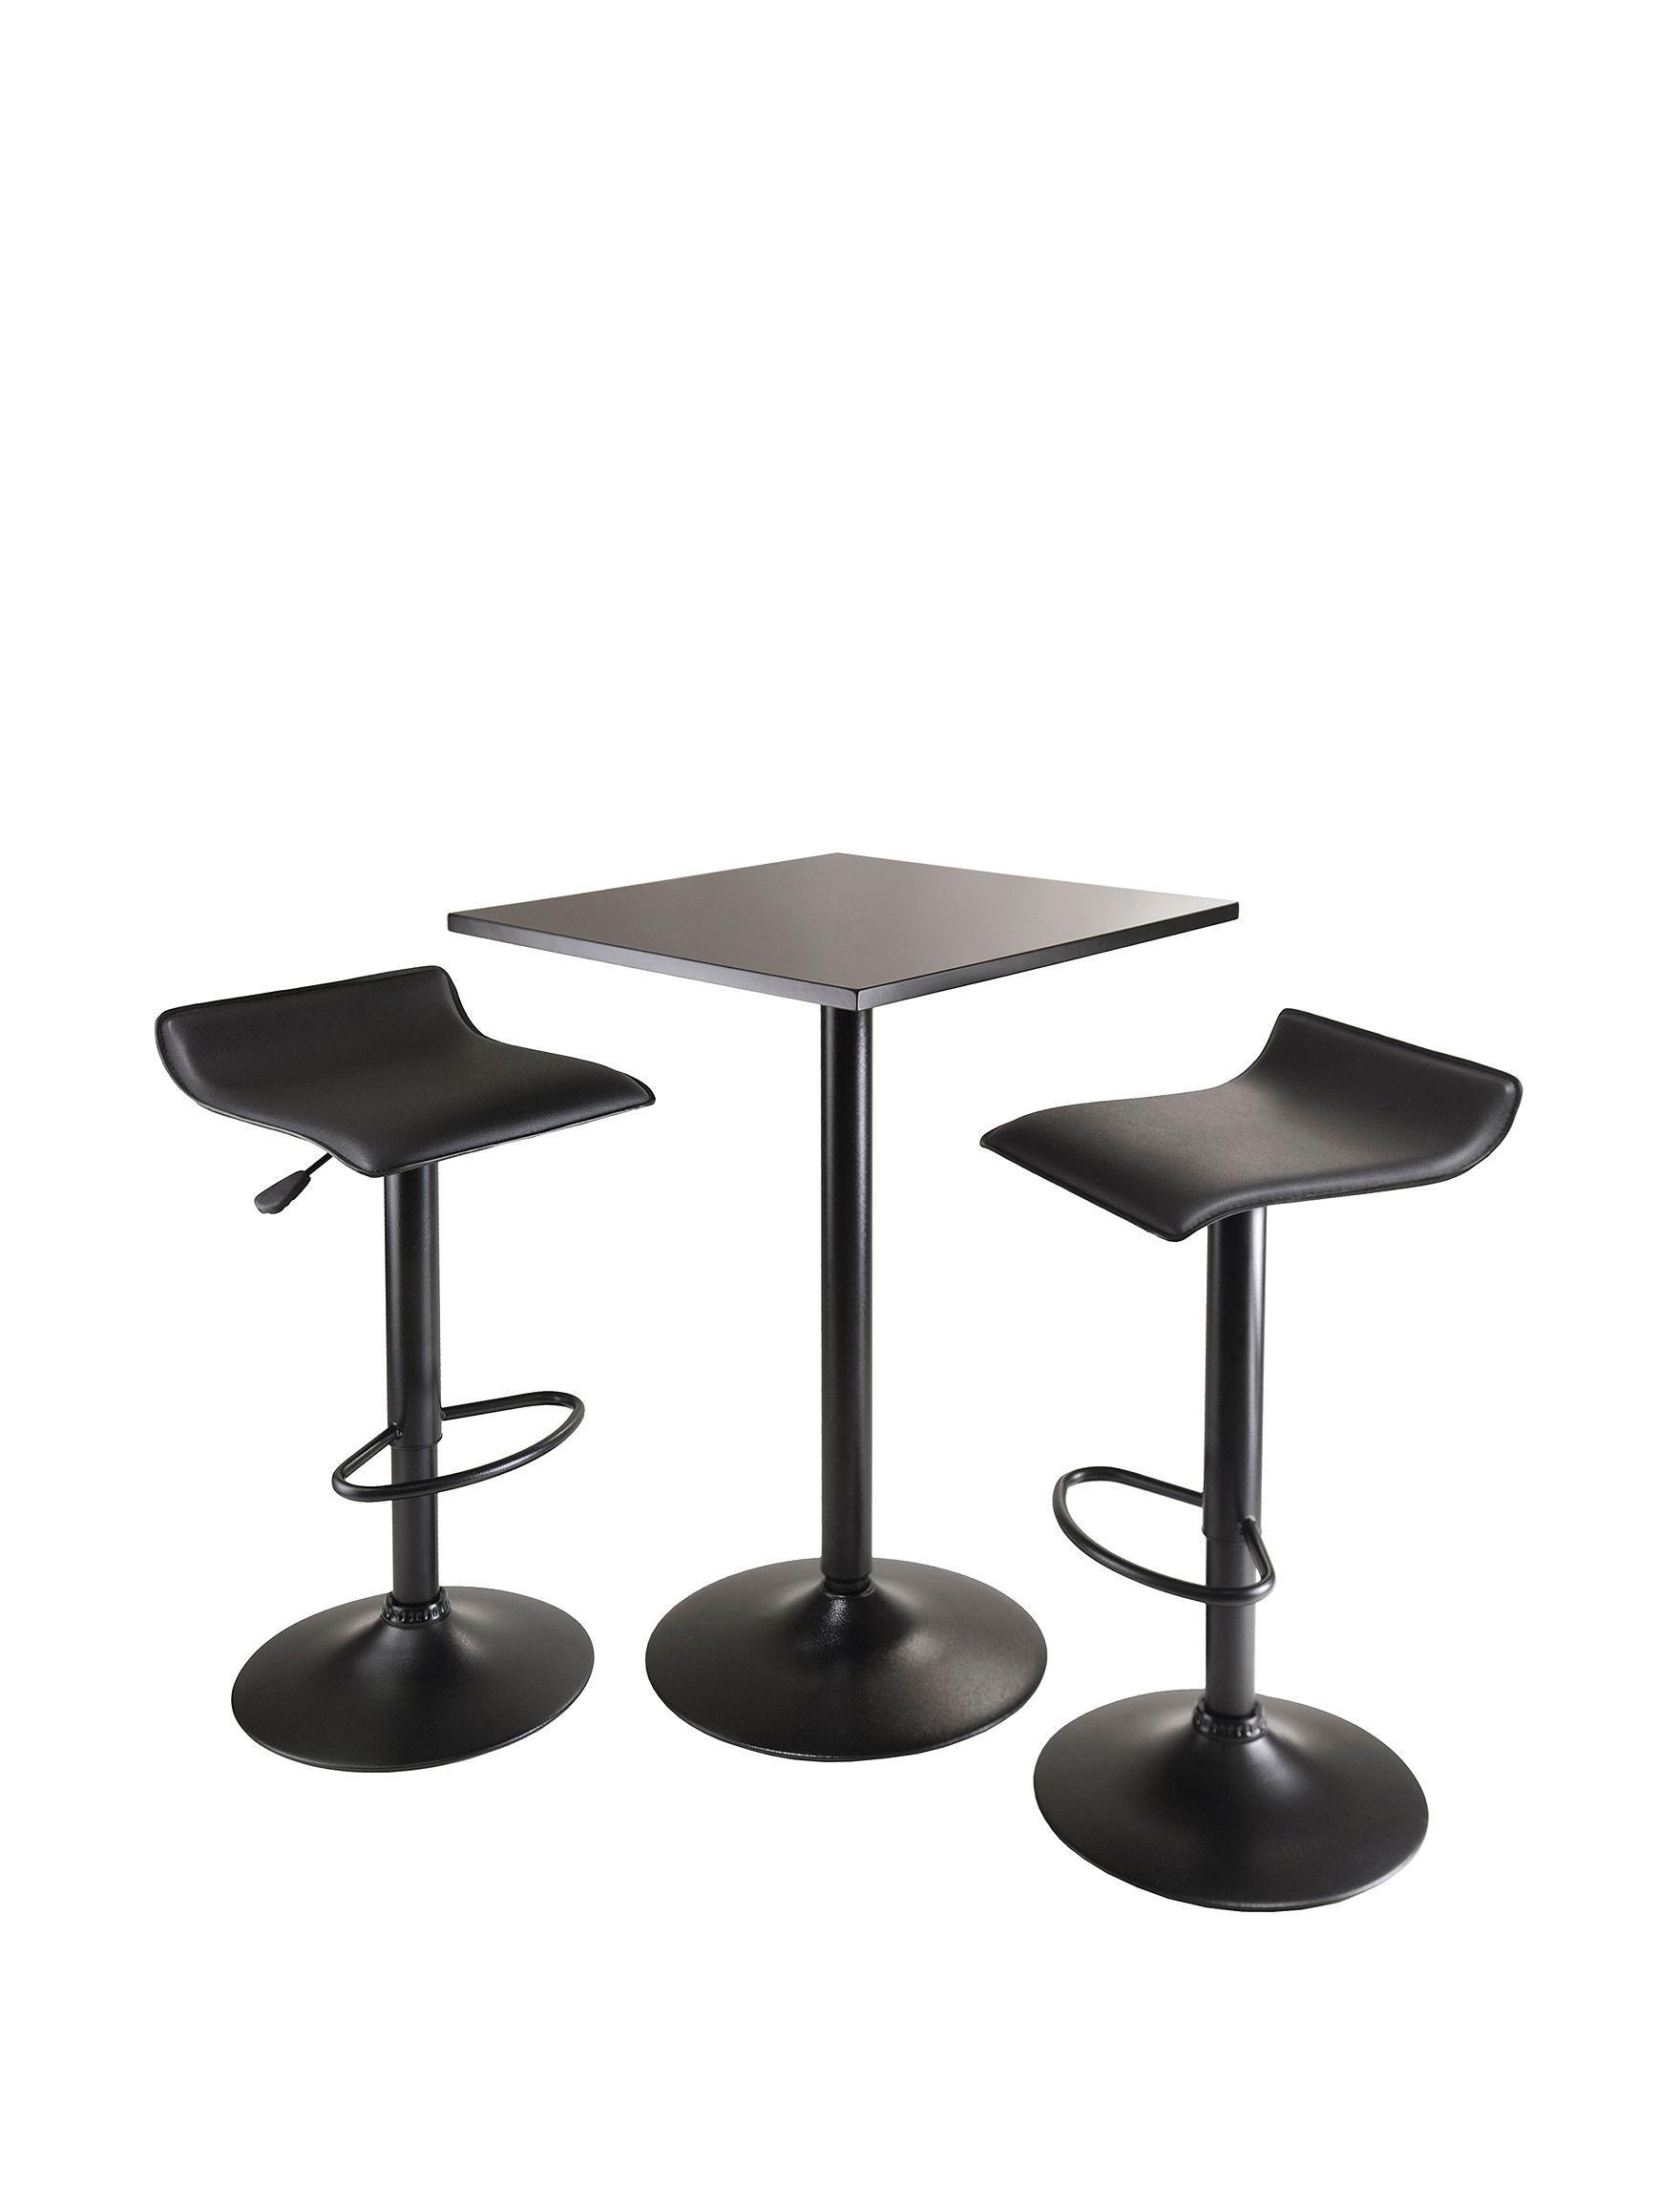 Winsome Black Dining Room Sets Kitchen & Dining Furniture